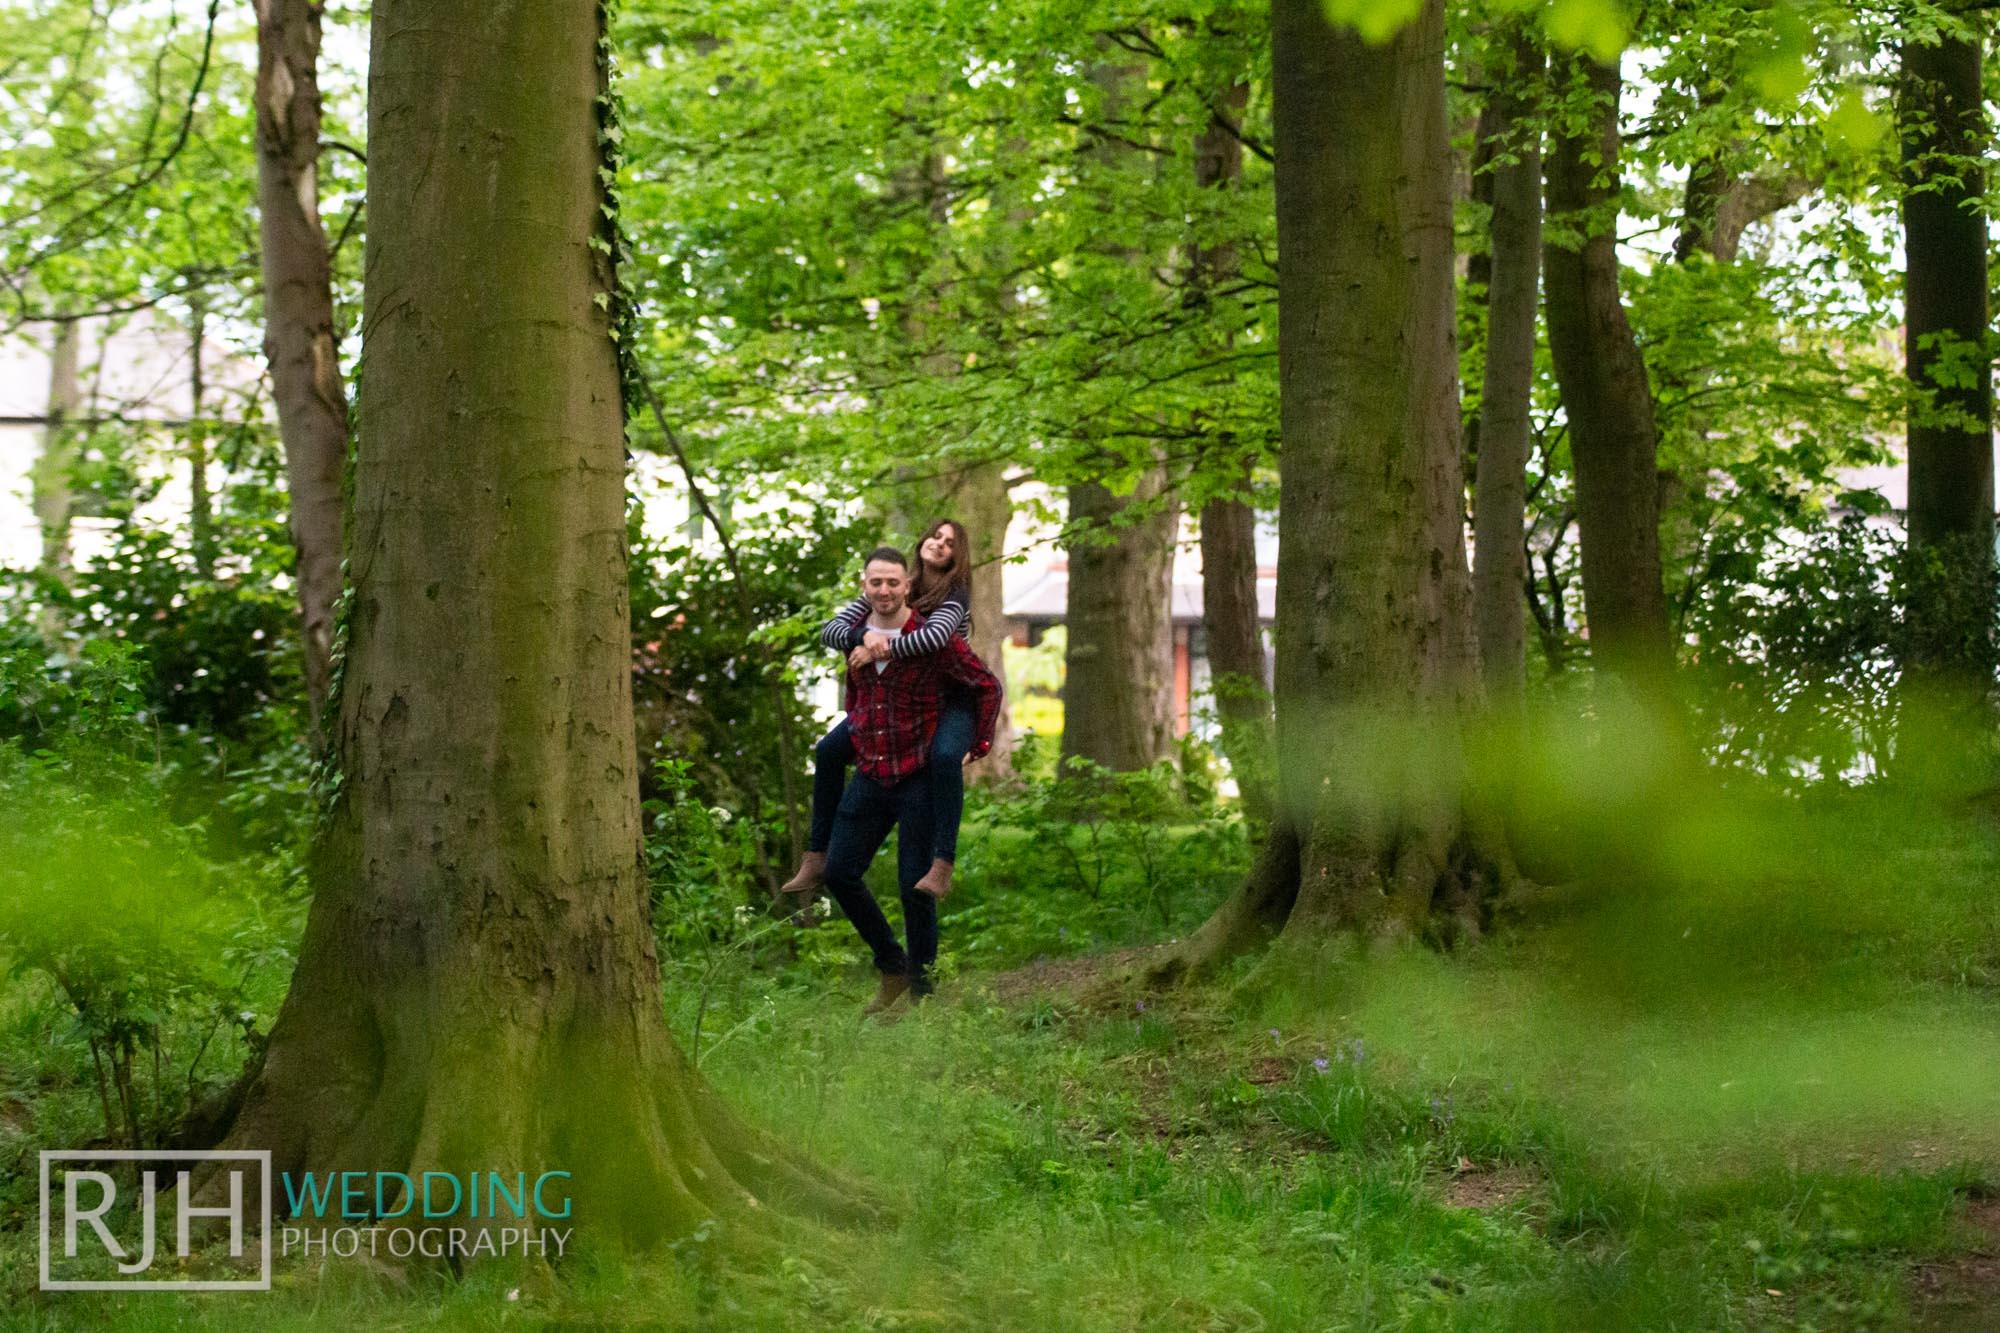 Pre-wedding photography_Abbie & Reece_Graves Park_018_IMG_1334.jpg